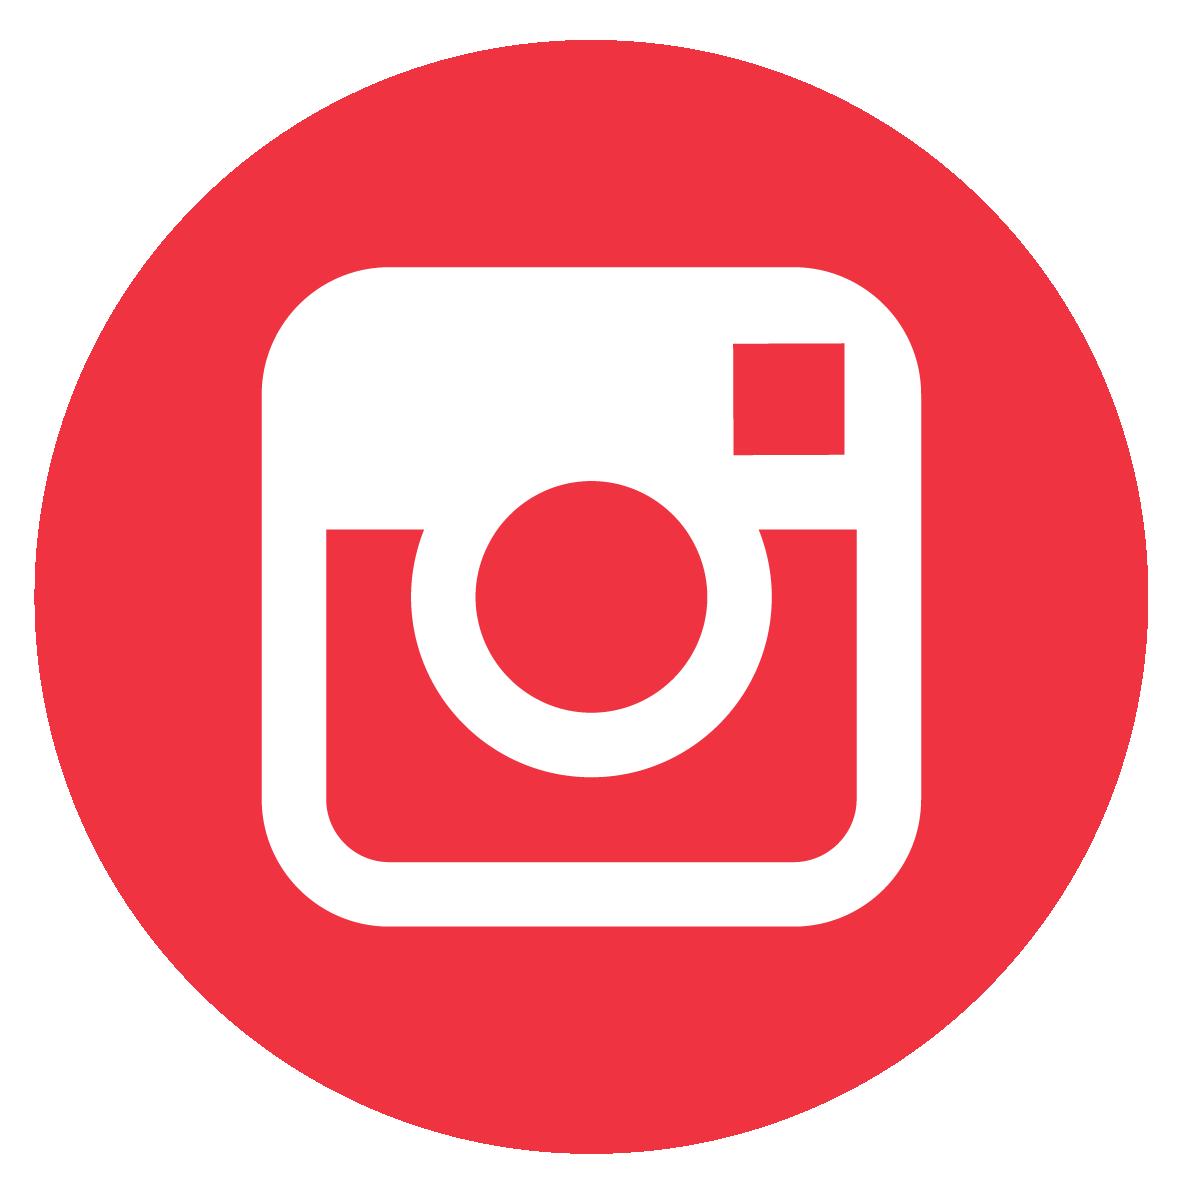 https://www.instagram.com/hackeandoprocessos/